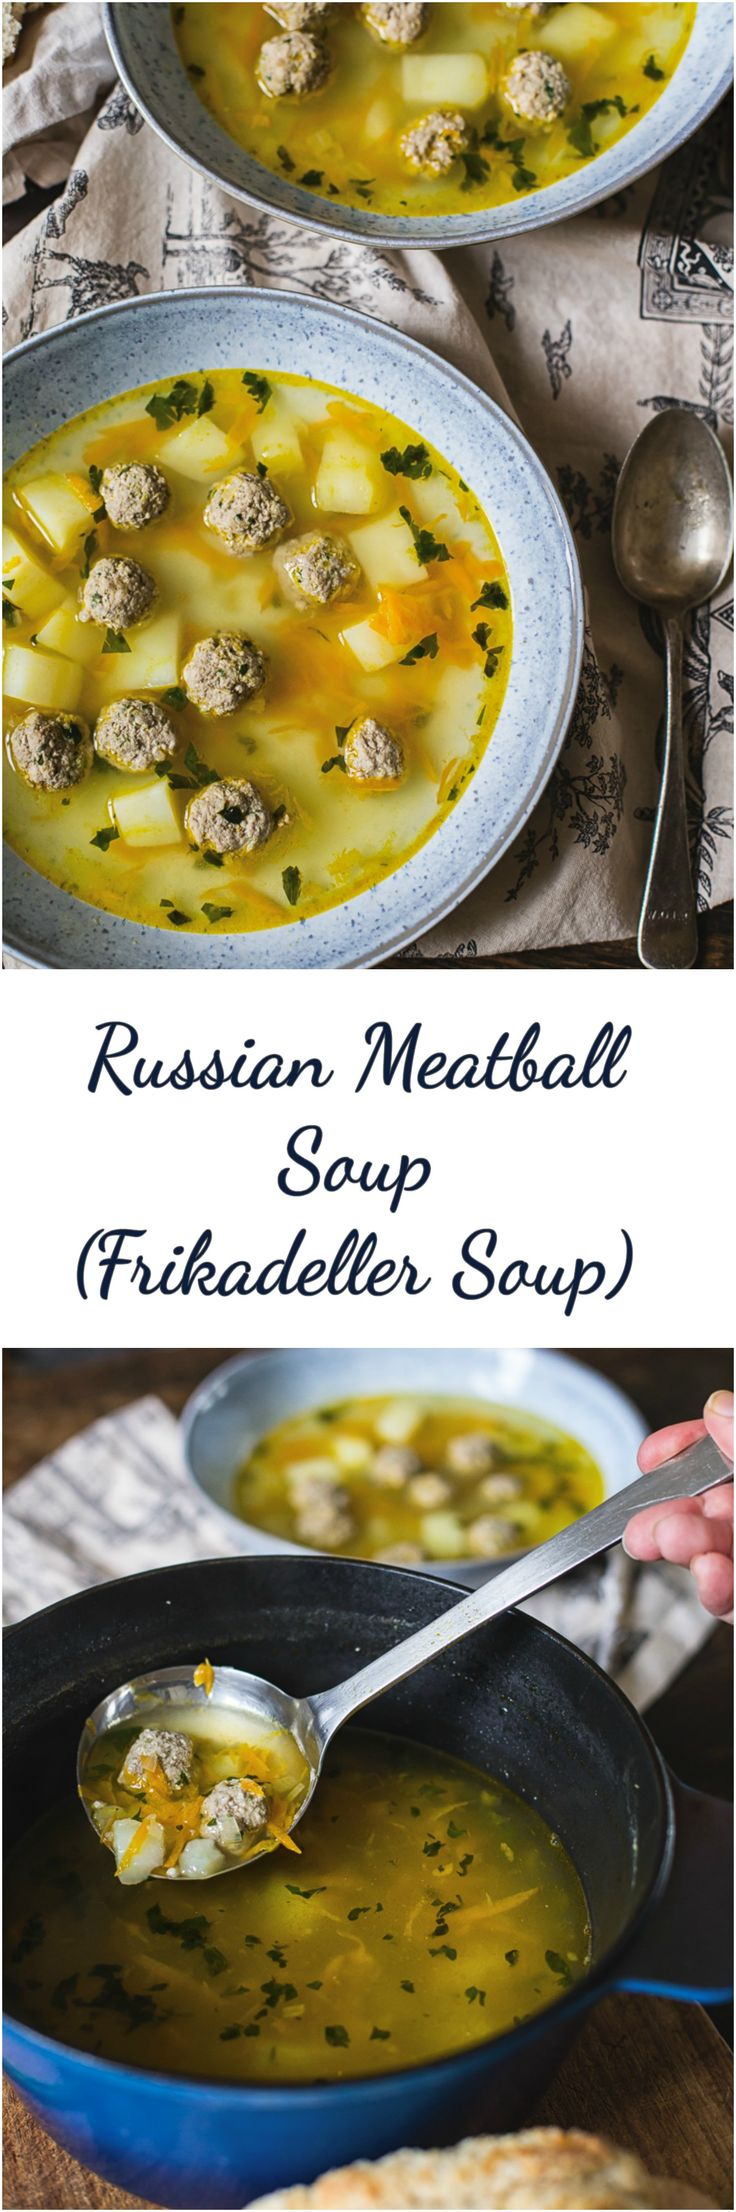 Russian Meatball Soup (Frikadeller Soup) #meatball soup #frikadellersoup